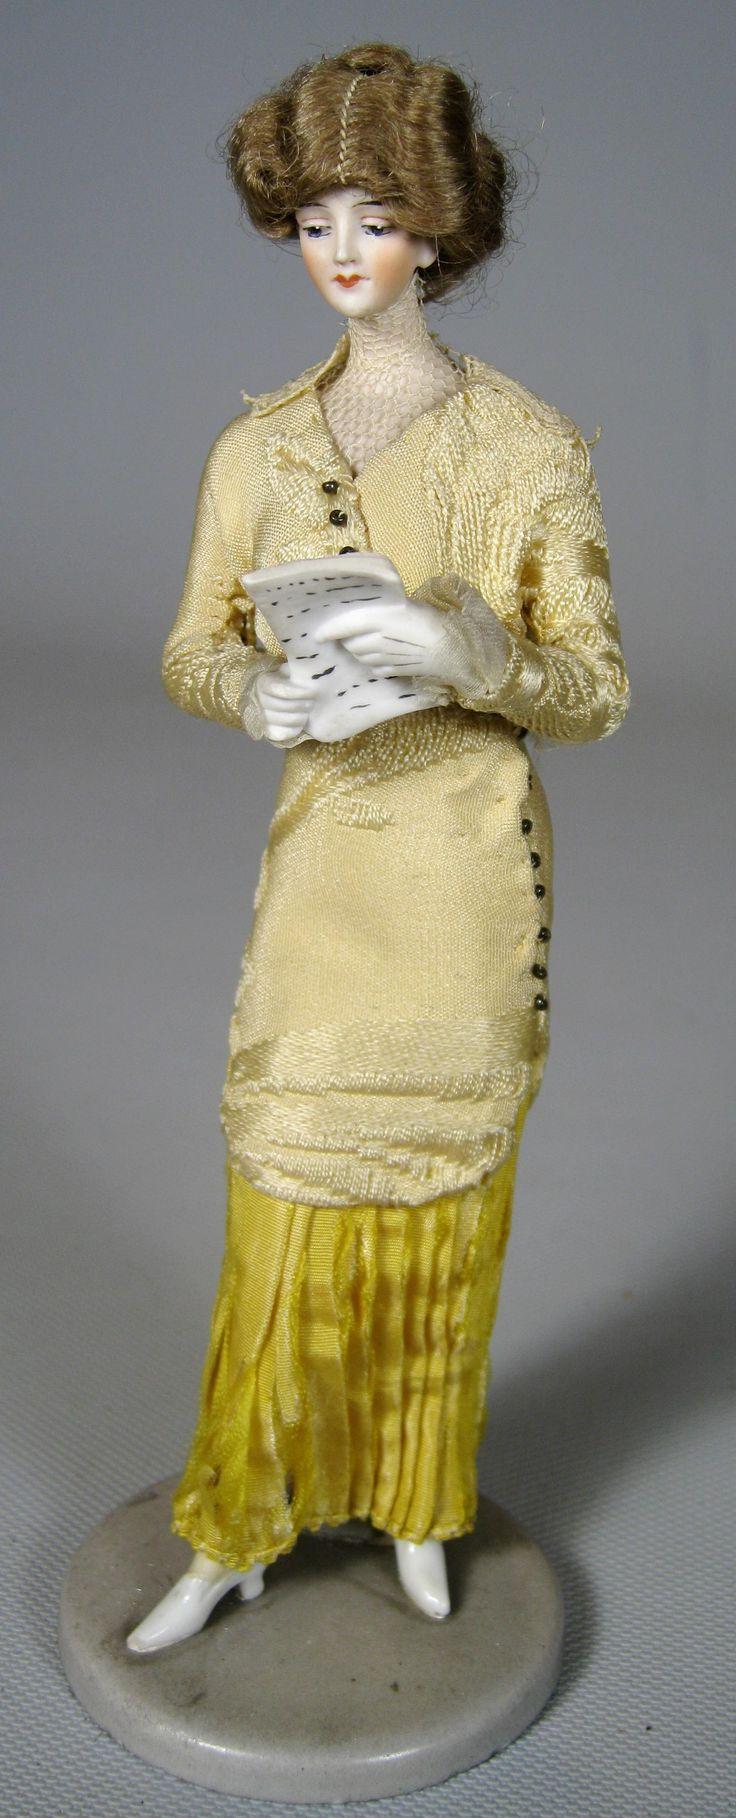 Galluba Hoffman Antique German Bisque Fashion Doll Bathing Beauty Figurine